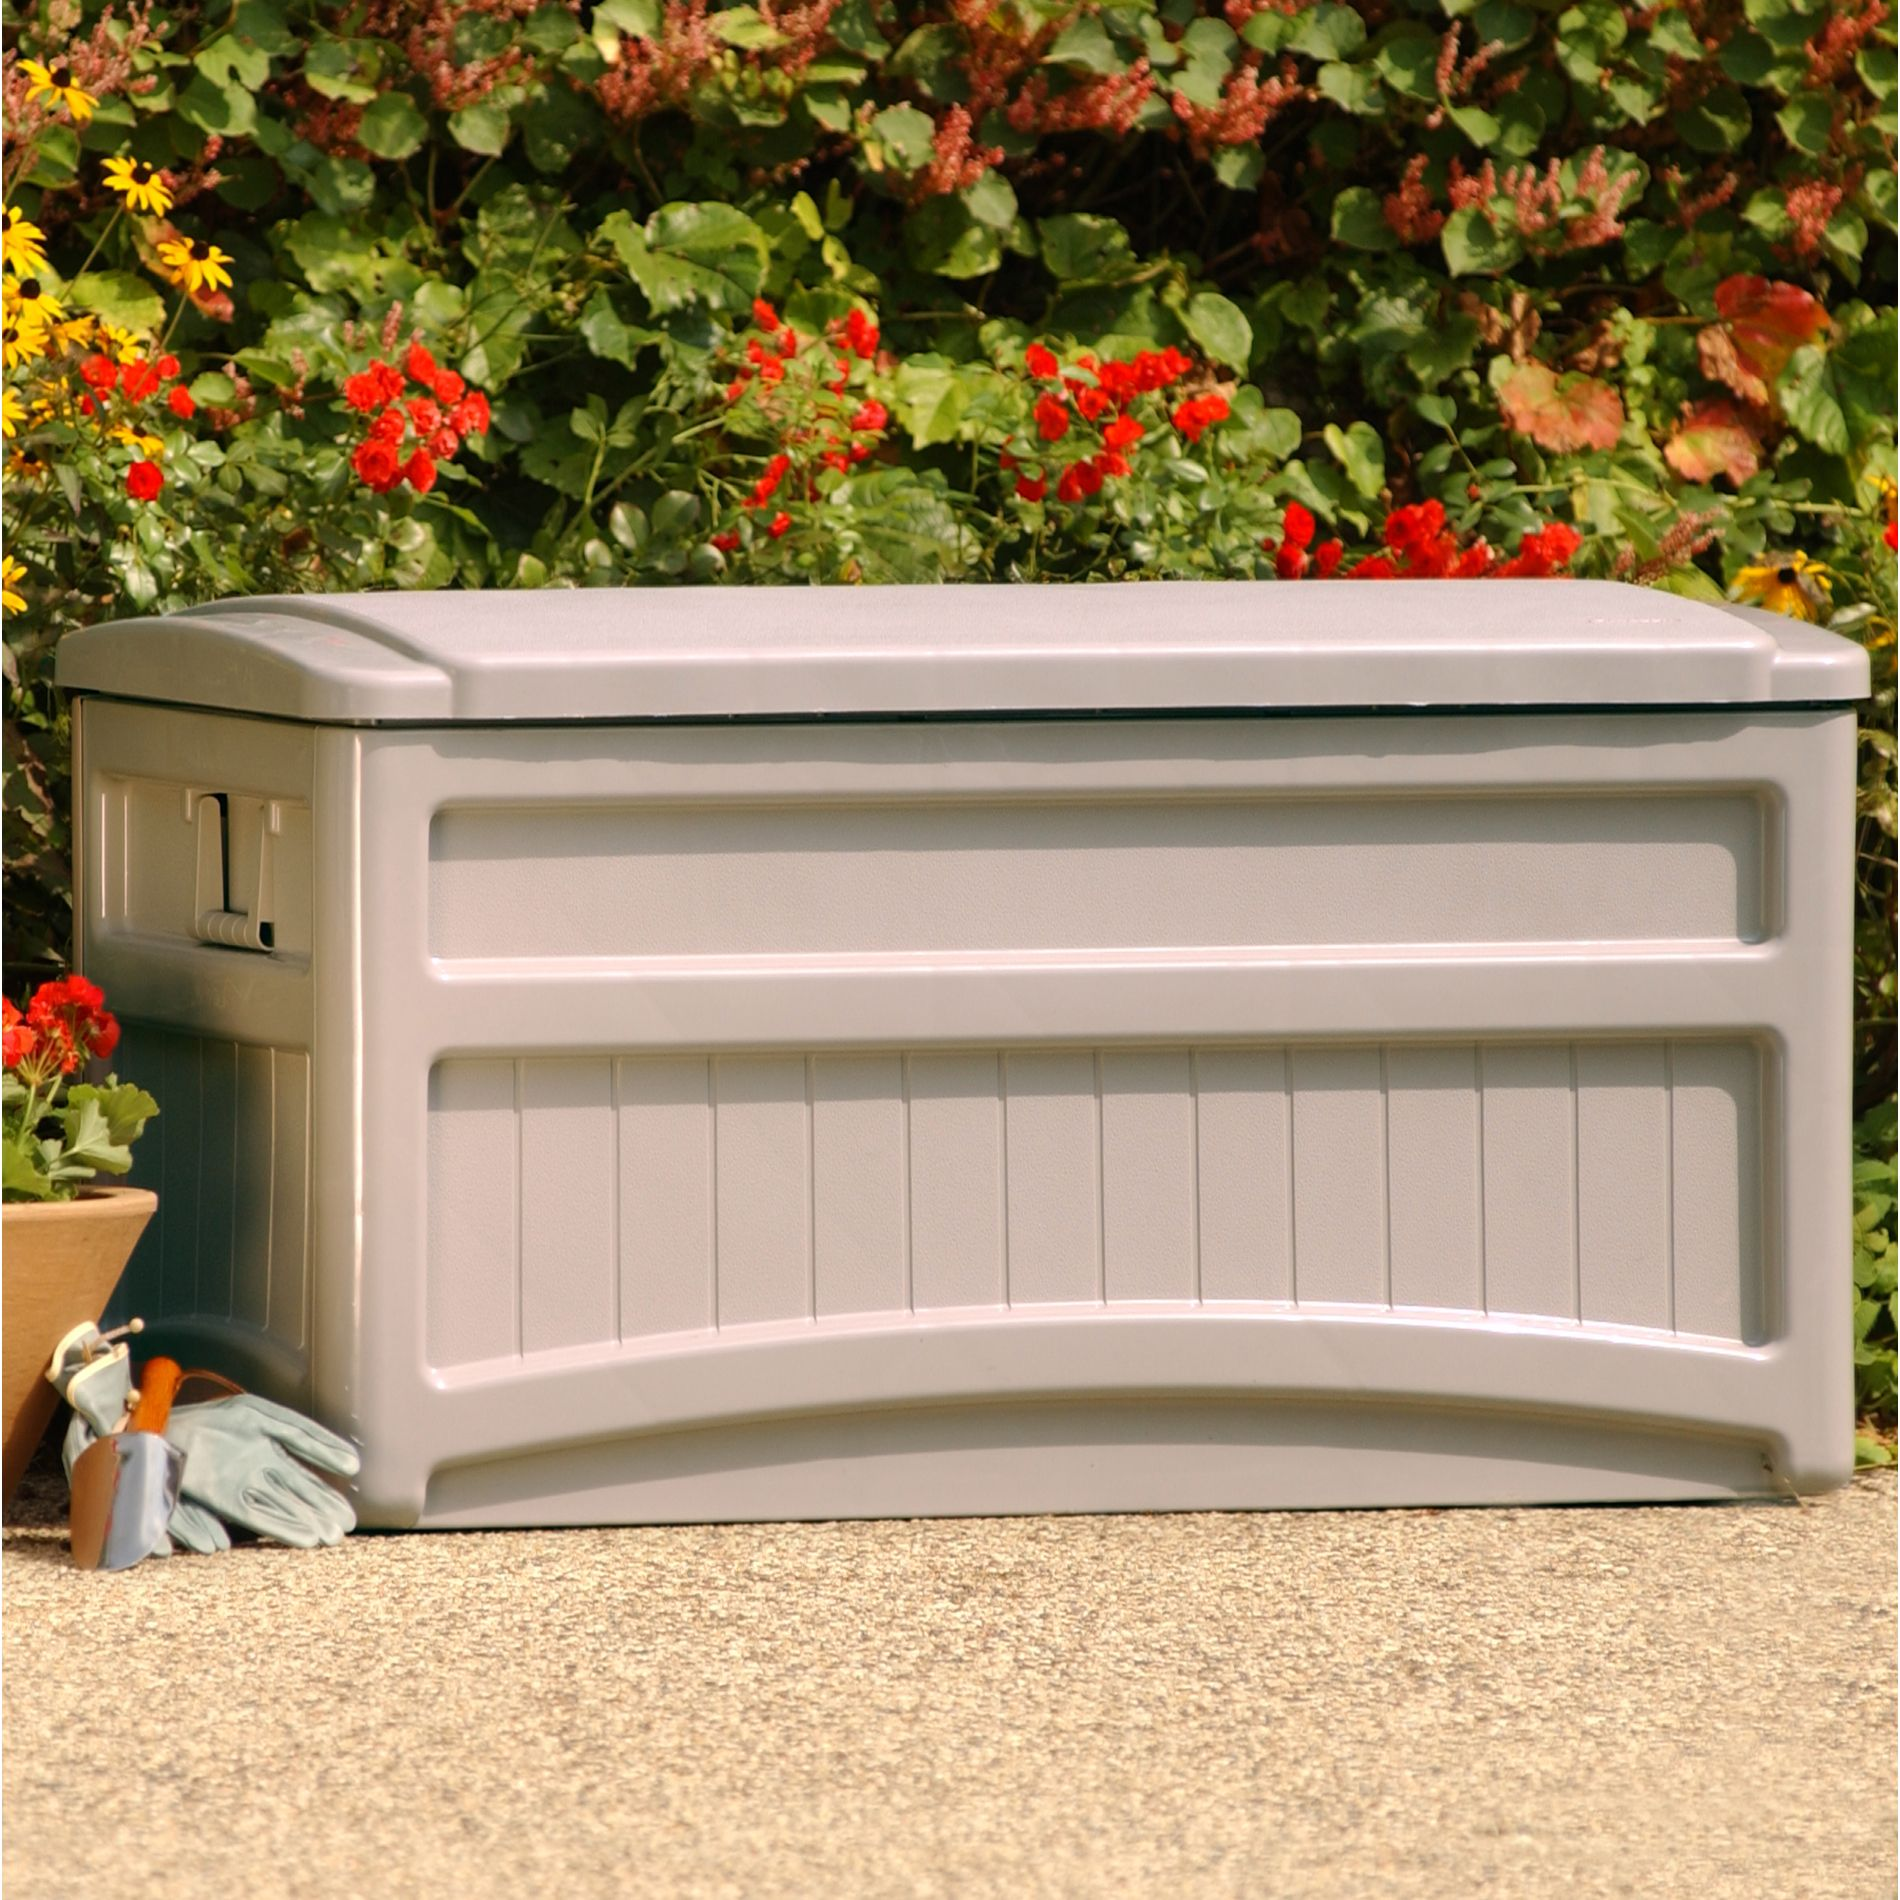 Suncast Outdoor Storage Box WWheels